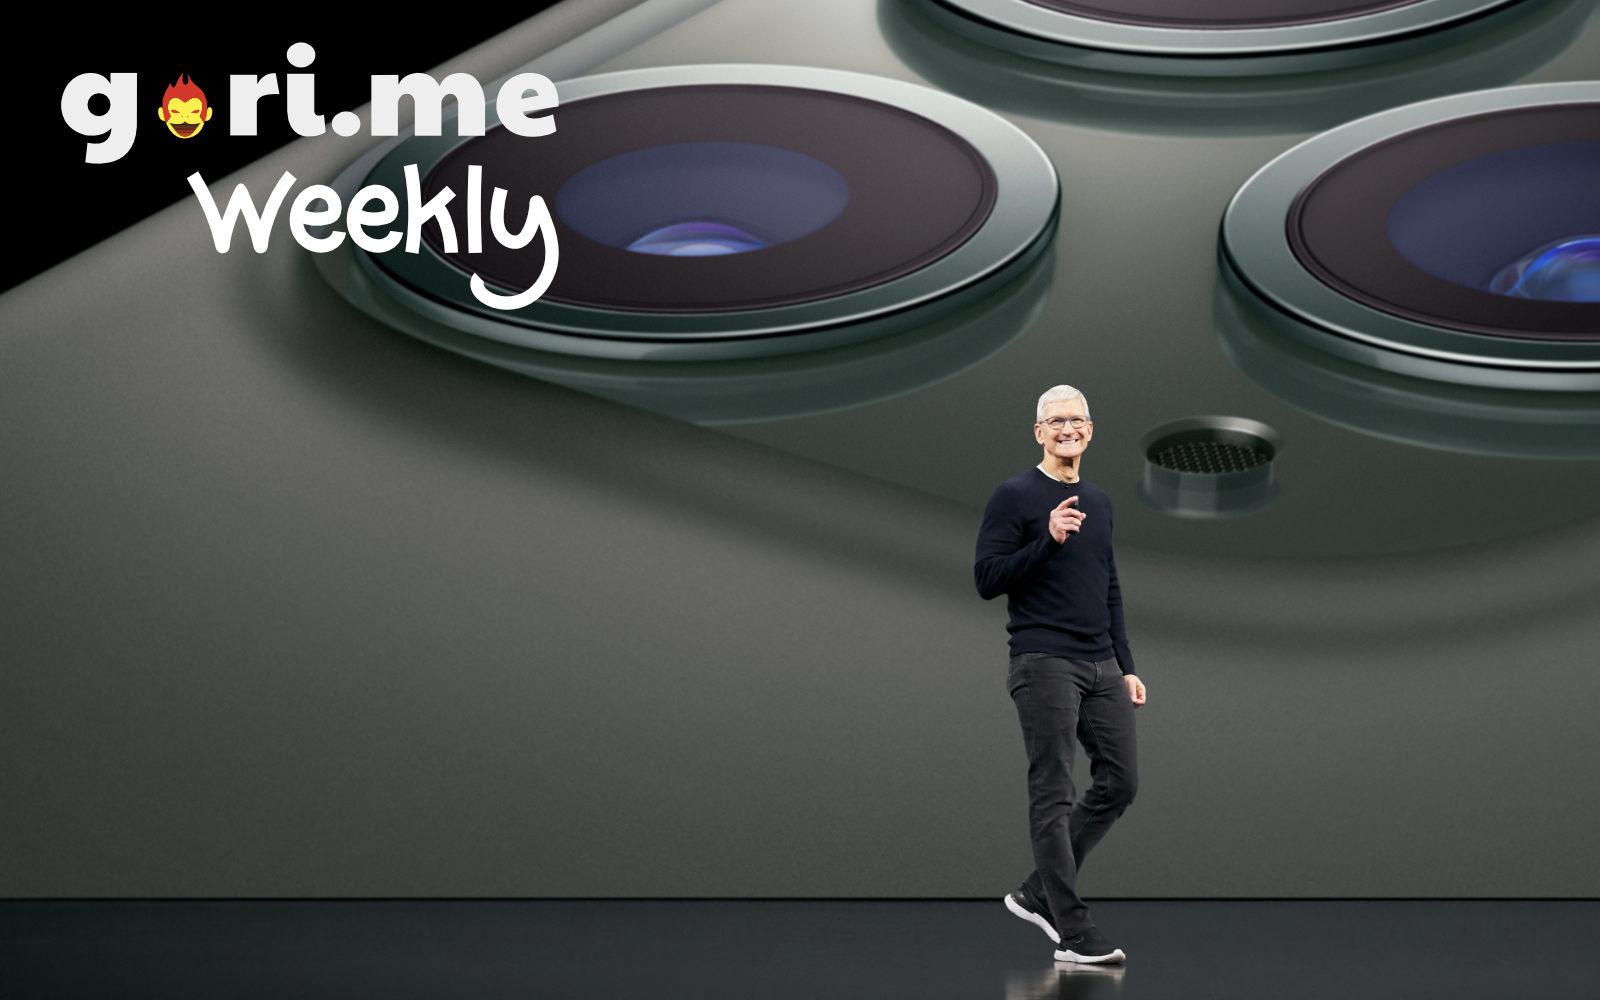 Gorime weekly iphone presentation